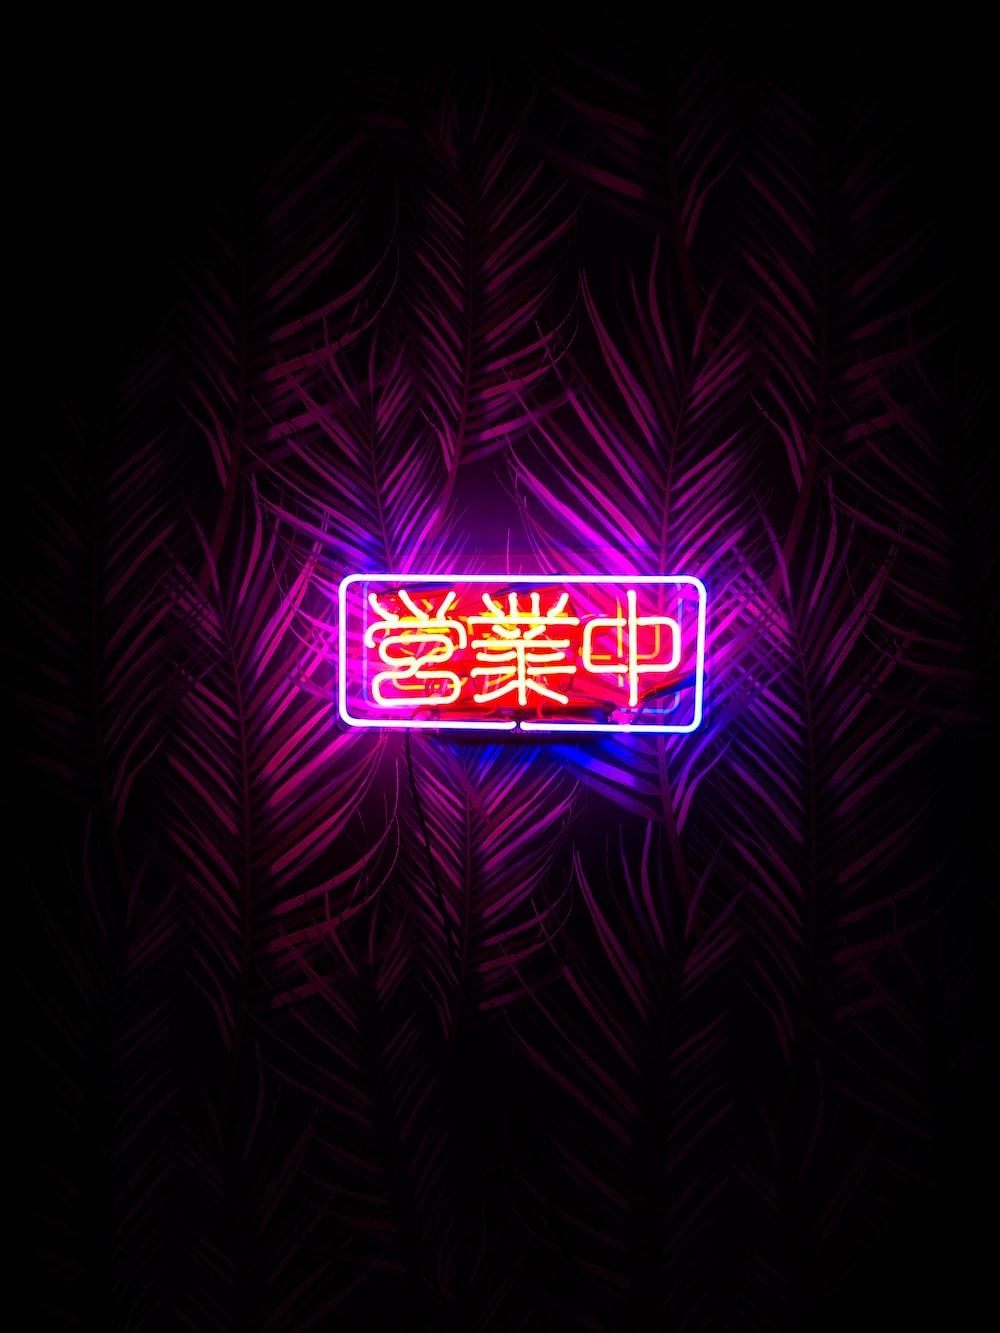 kanji script neon signage